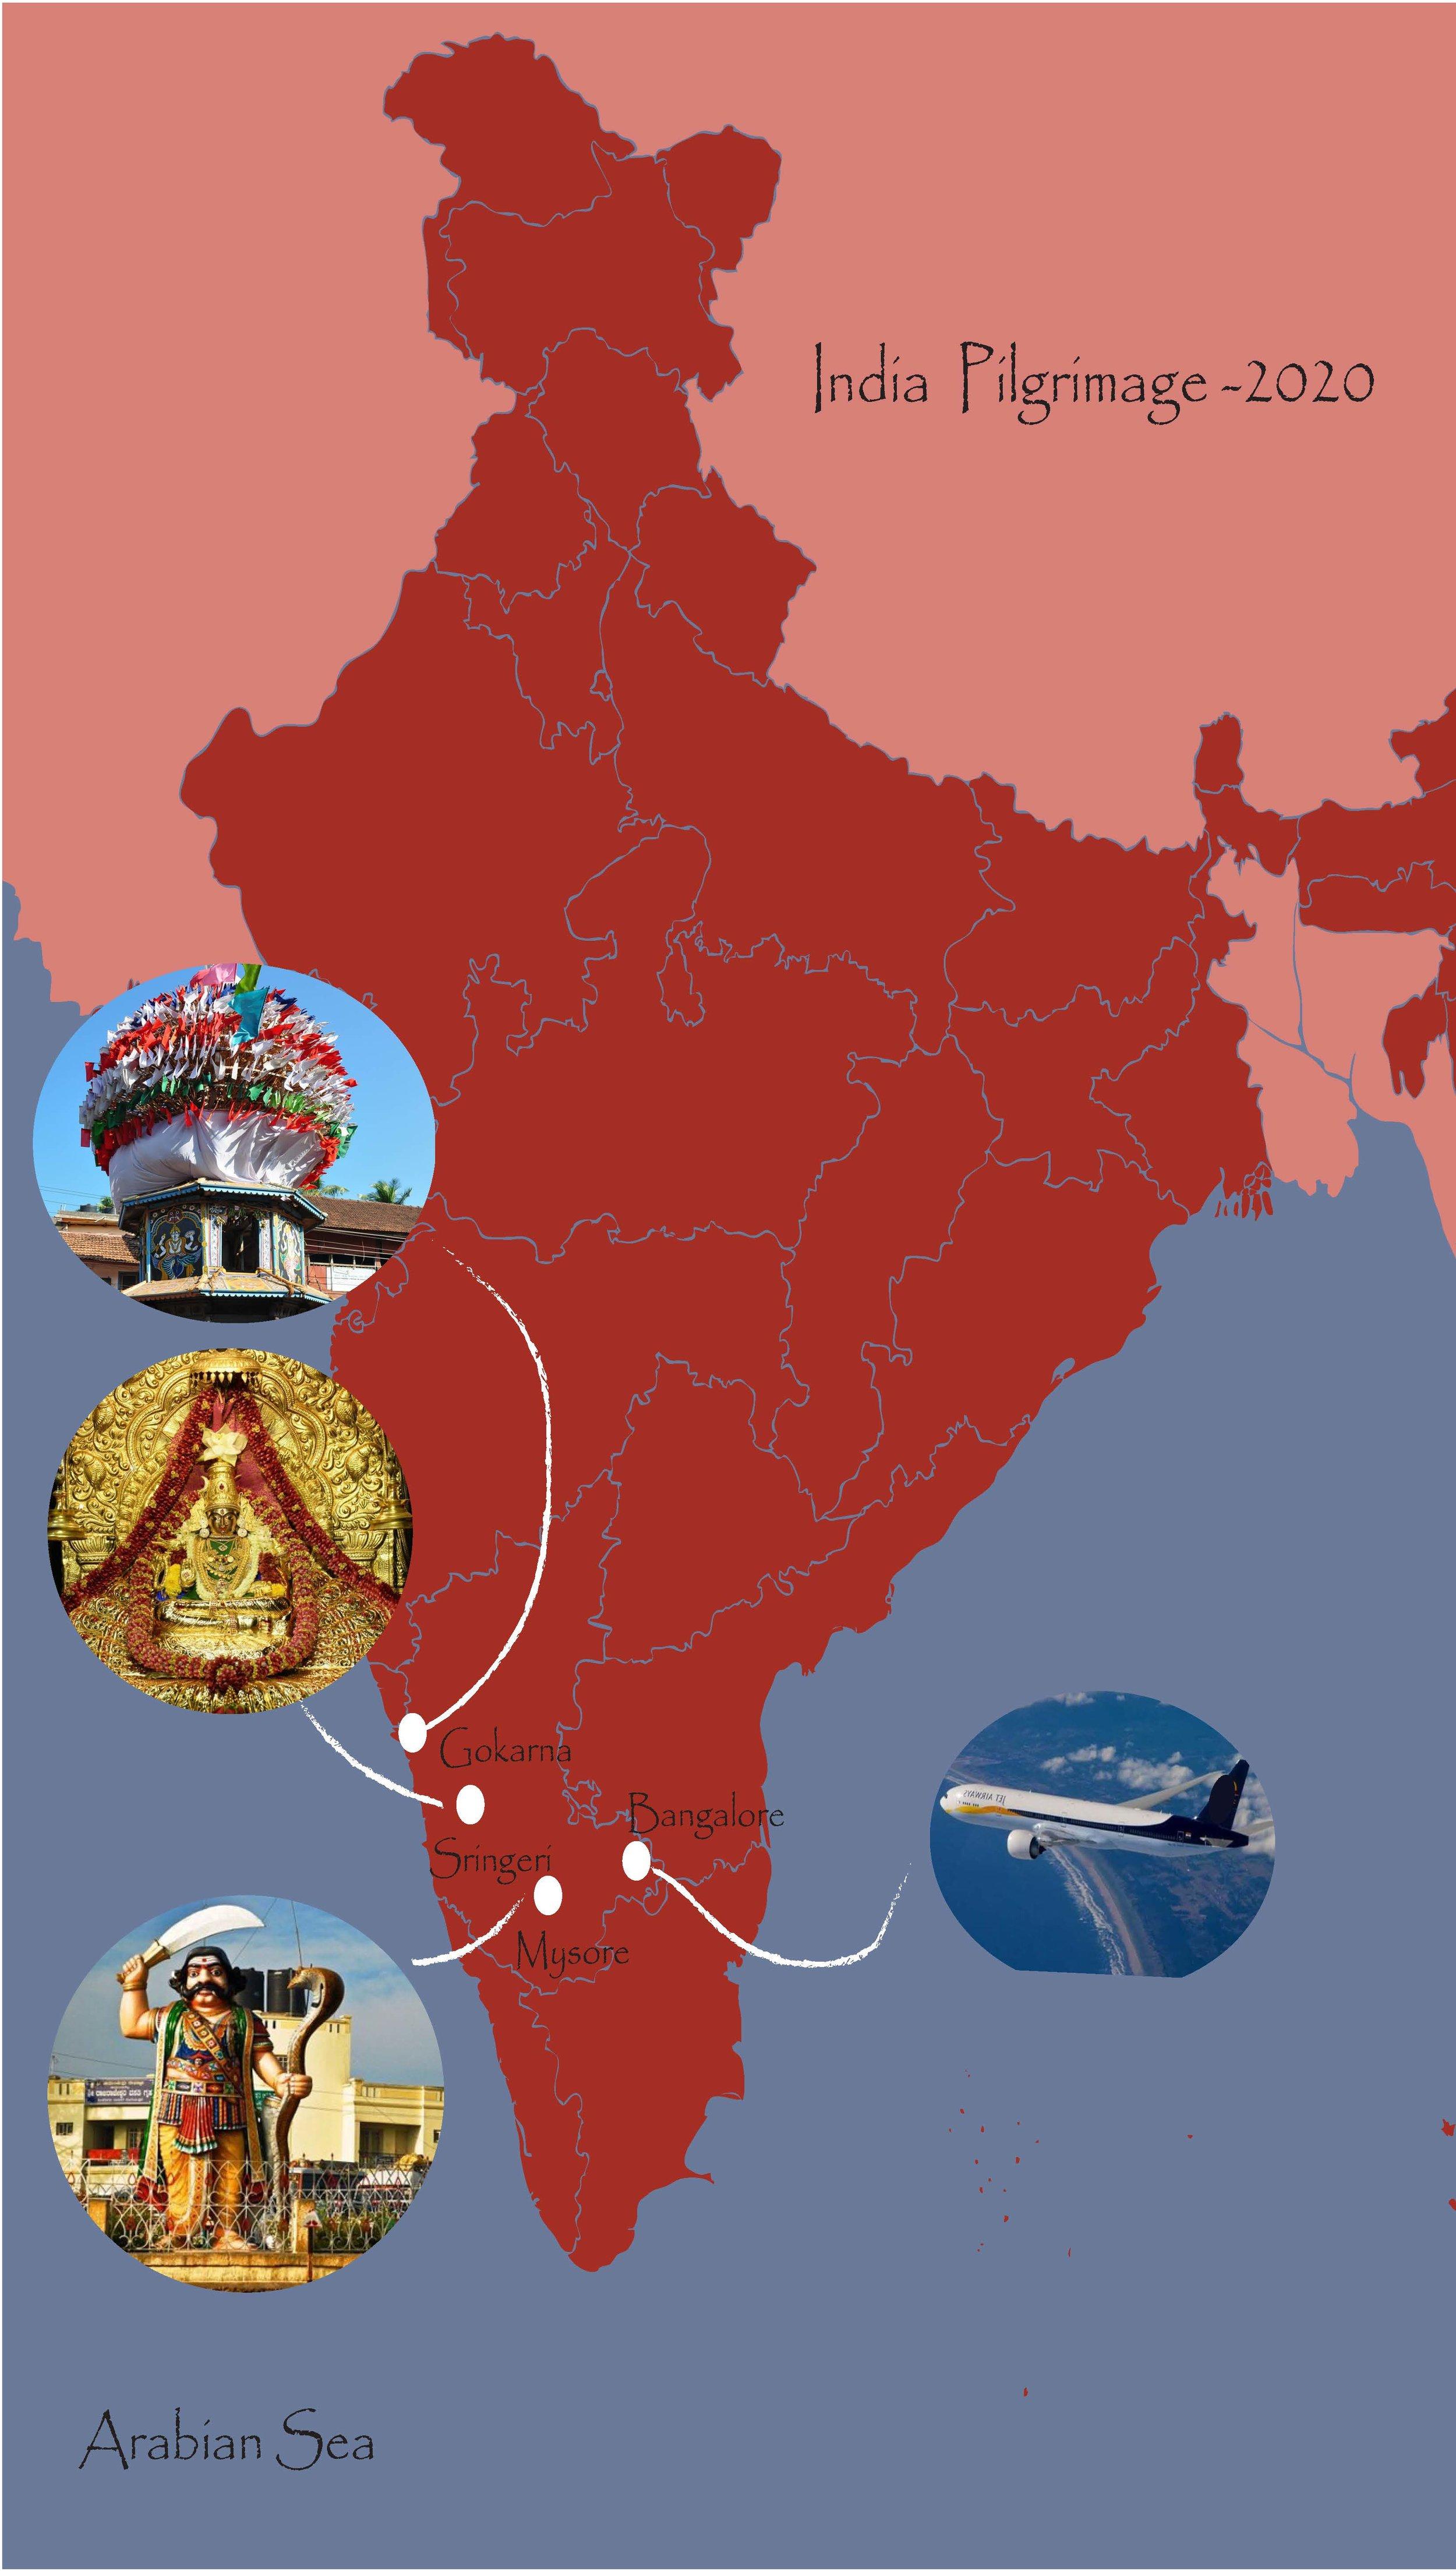 India Pilgrimage 2020 Map.jpg